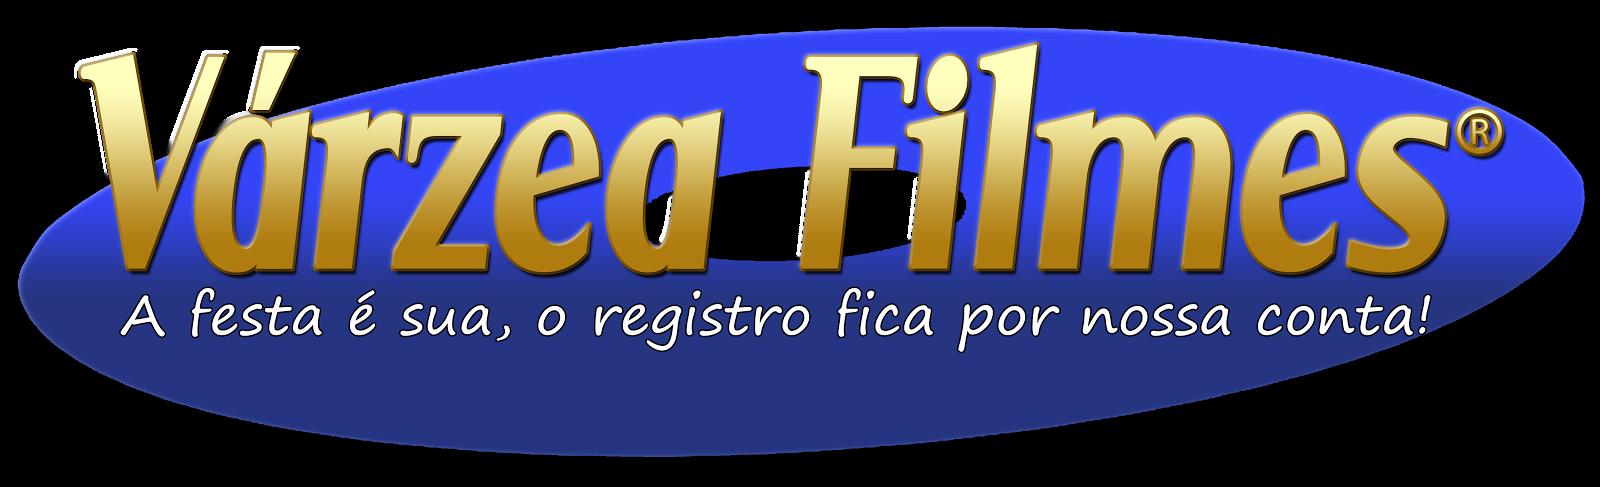 VÁRZEA FILMES ®